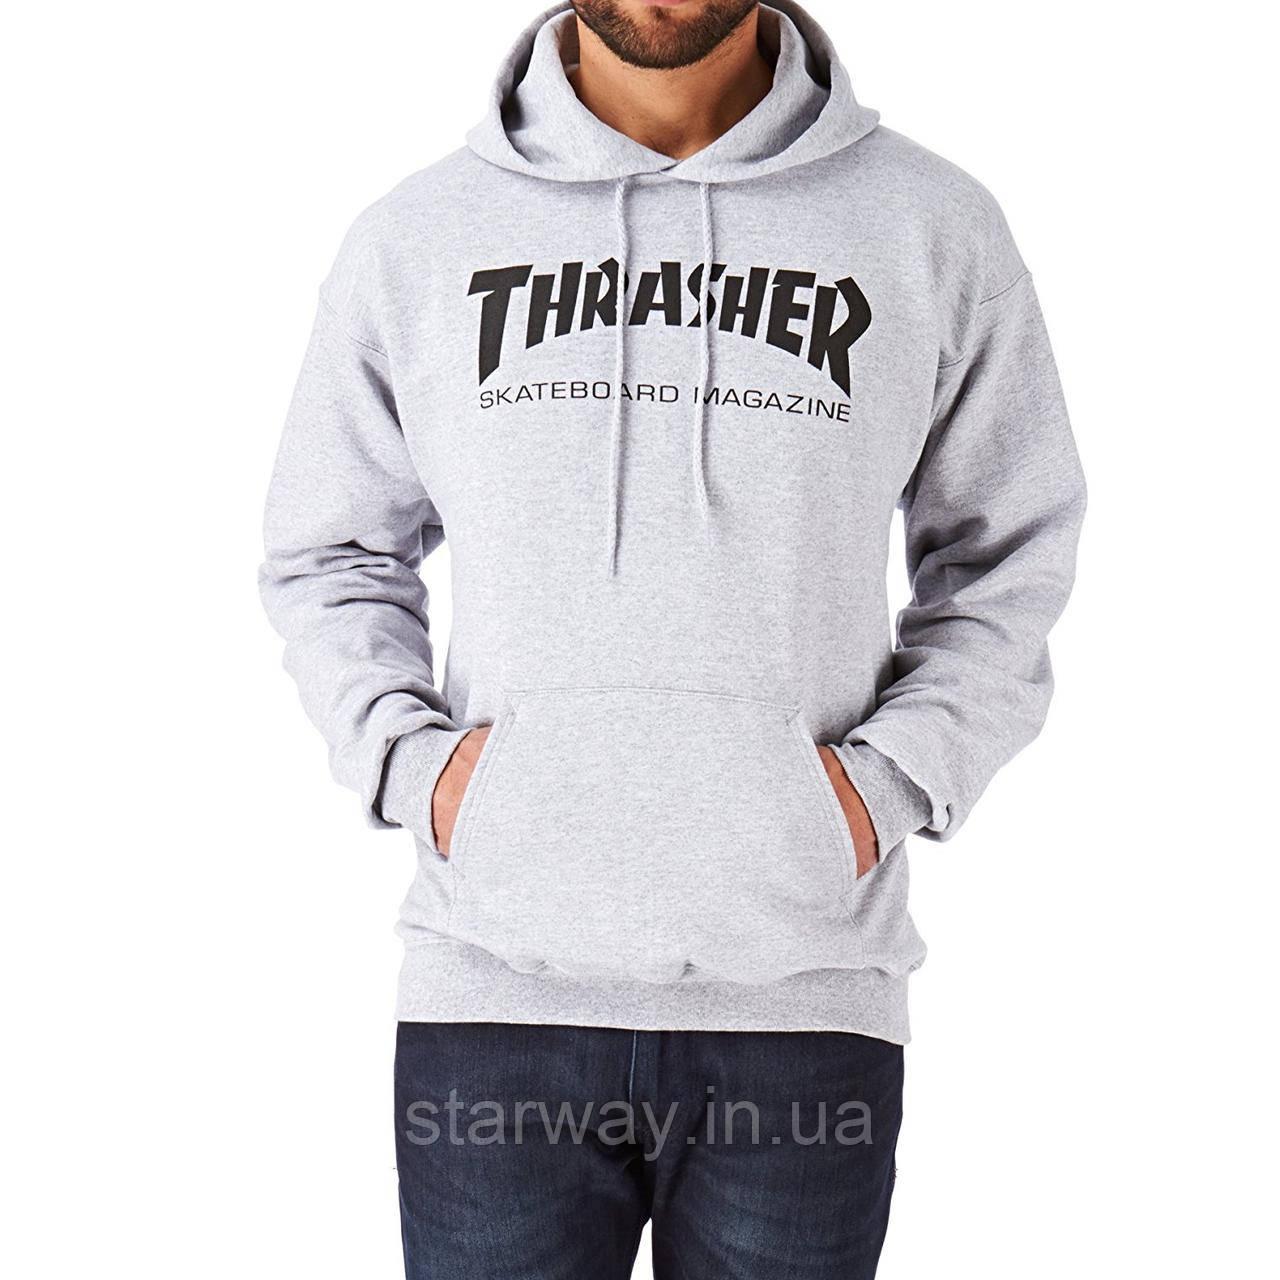 Толстовка серая с принтом Thrasher Skateboard Magazine | Худи трэшер